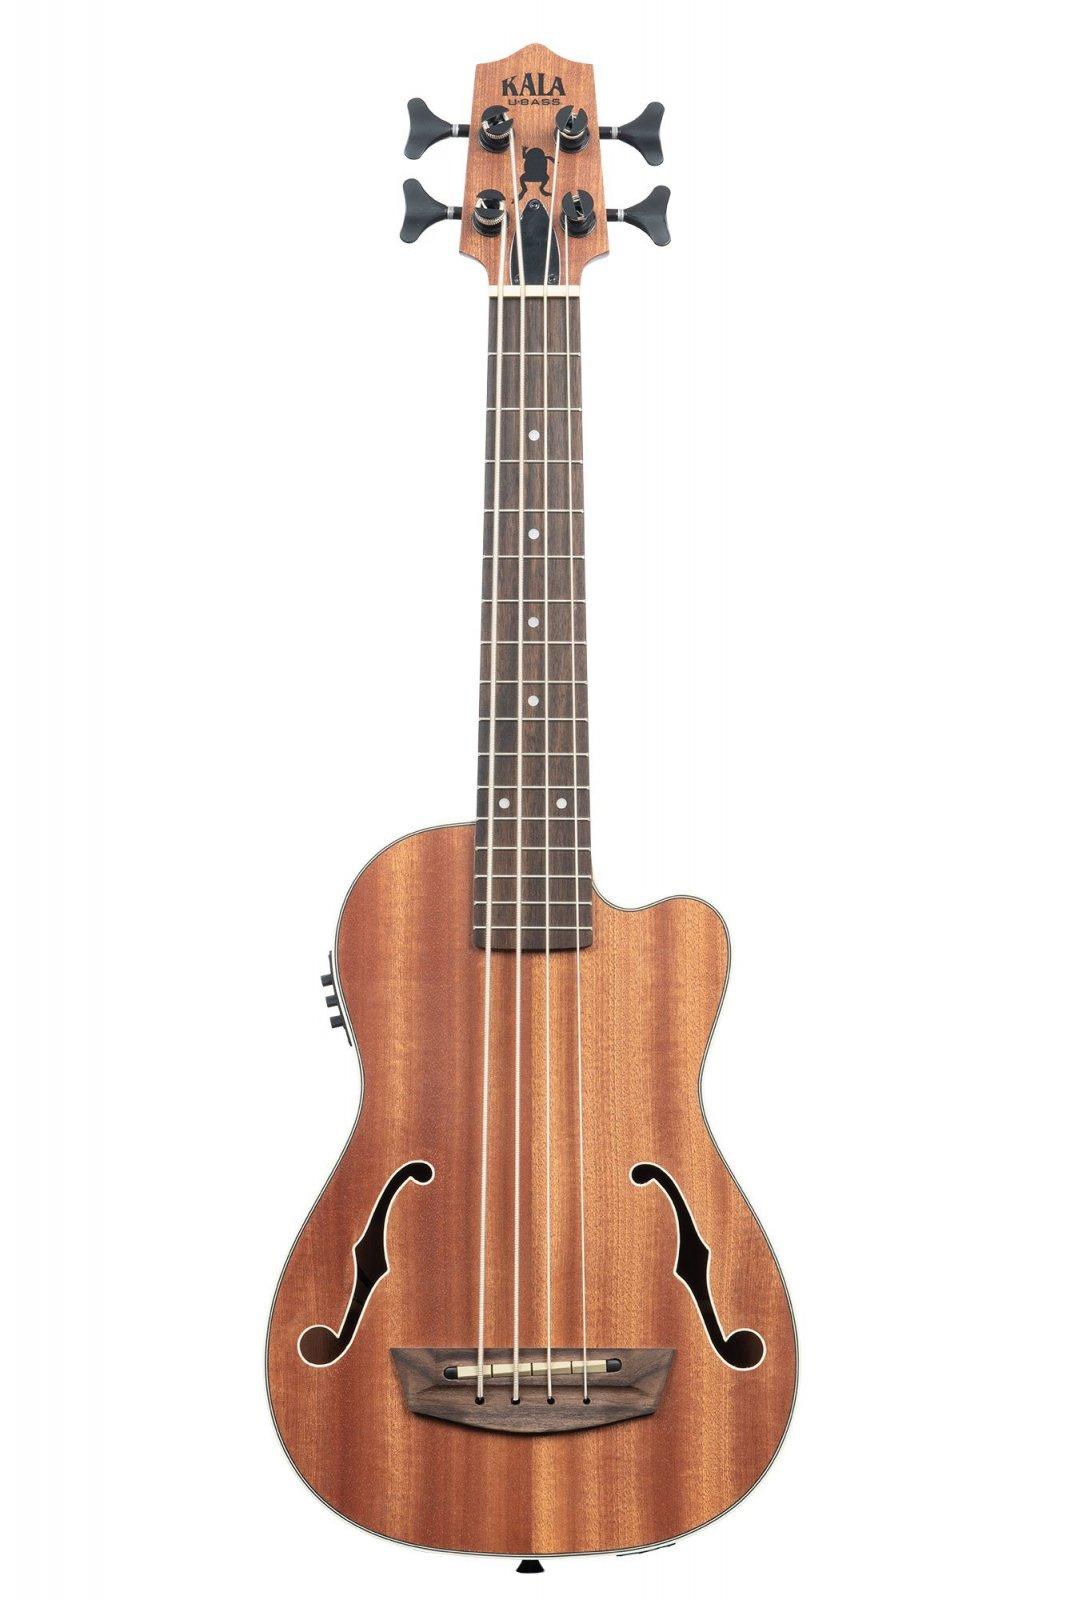 Kala UBASS-JYMN-FS Journeyman U-Bass with F-Holes and Electronics Natural